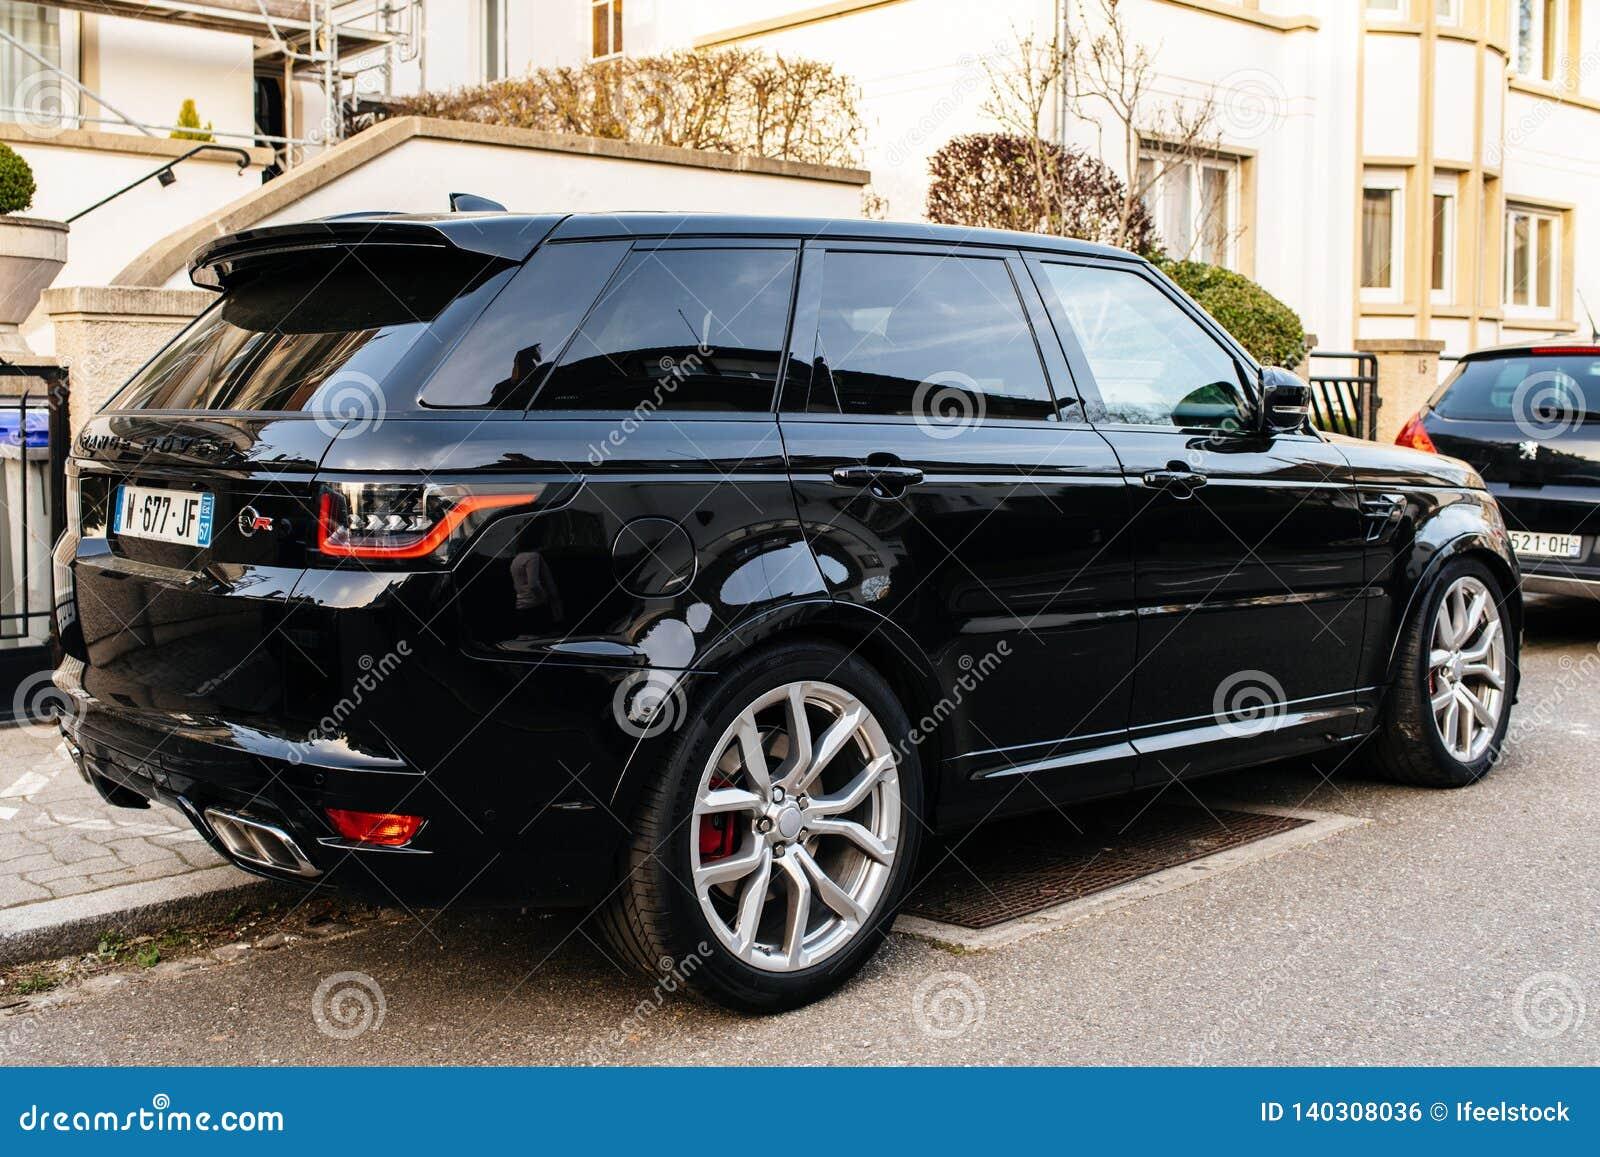 New Land Rover Range Rover Sport Svr Suv Editorial Photo Image Of Tire Evoque 140308036